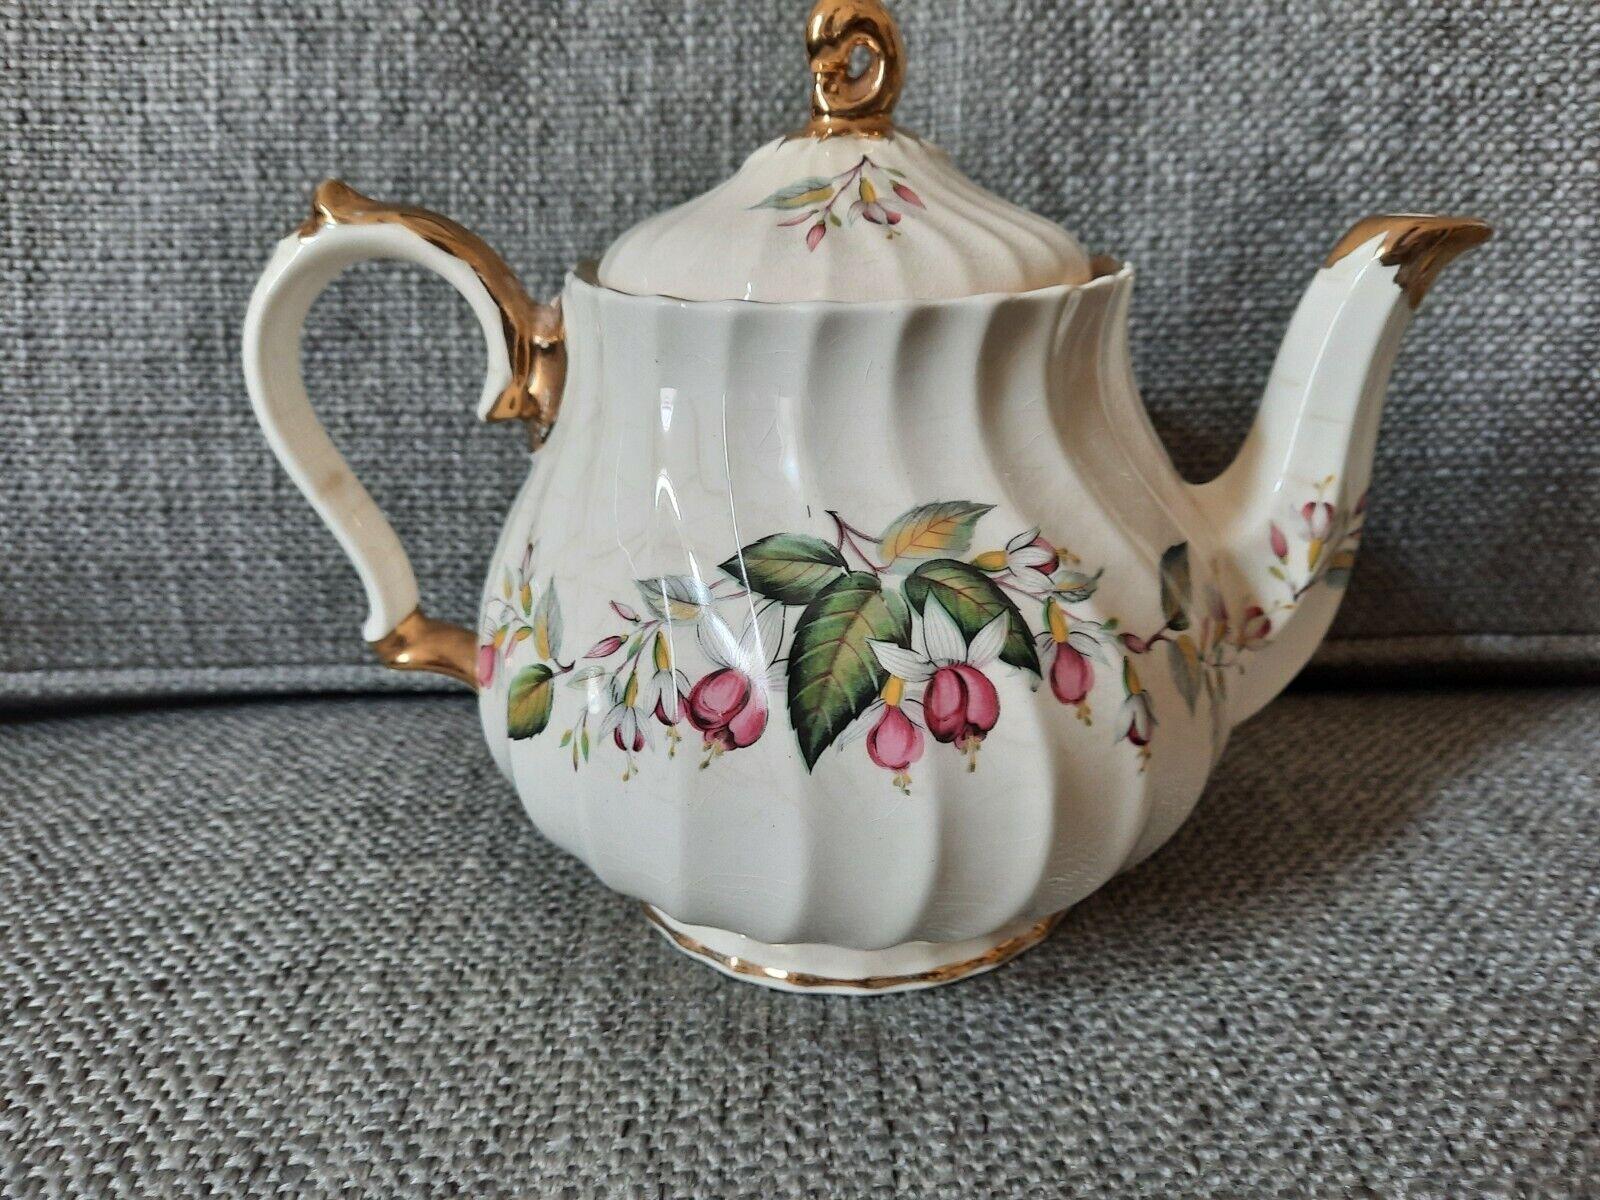 Sadler England China Tea Pot Fuchsia Vintage Flowers Numbered 1940 s Limited Ed. - $16.50